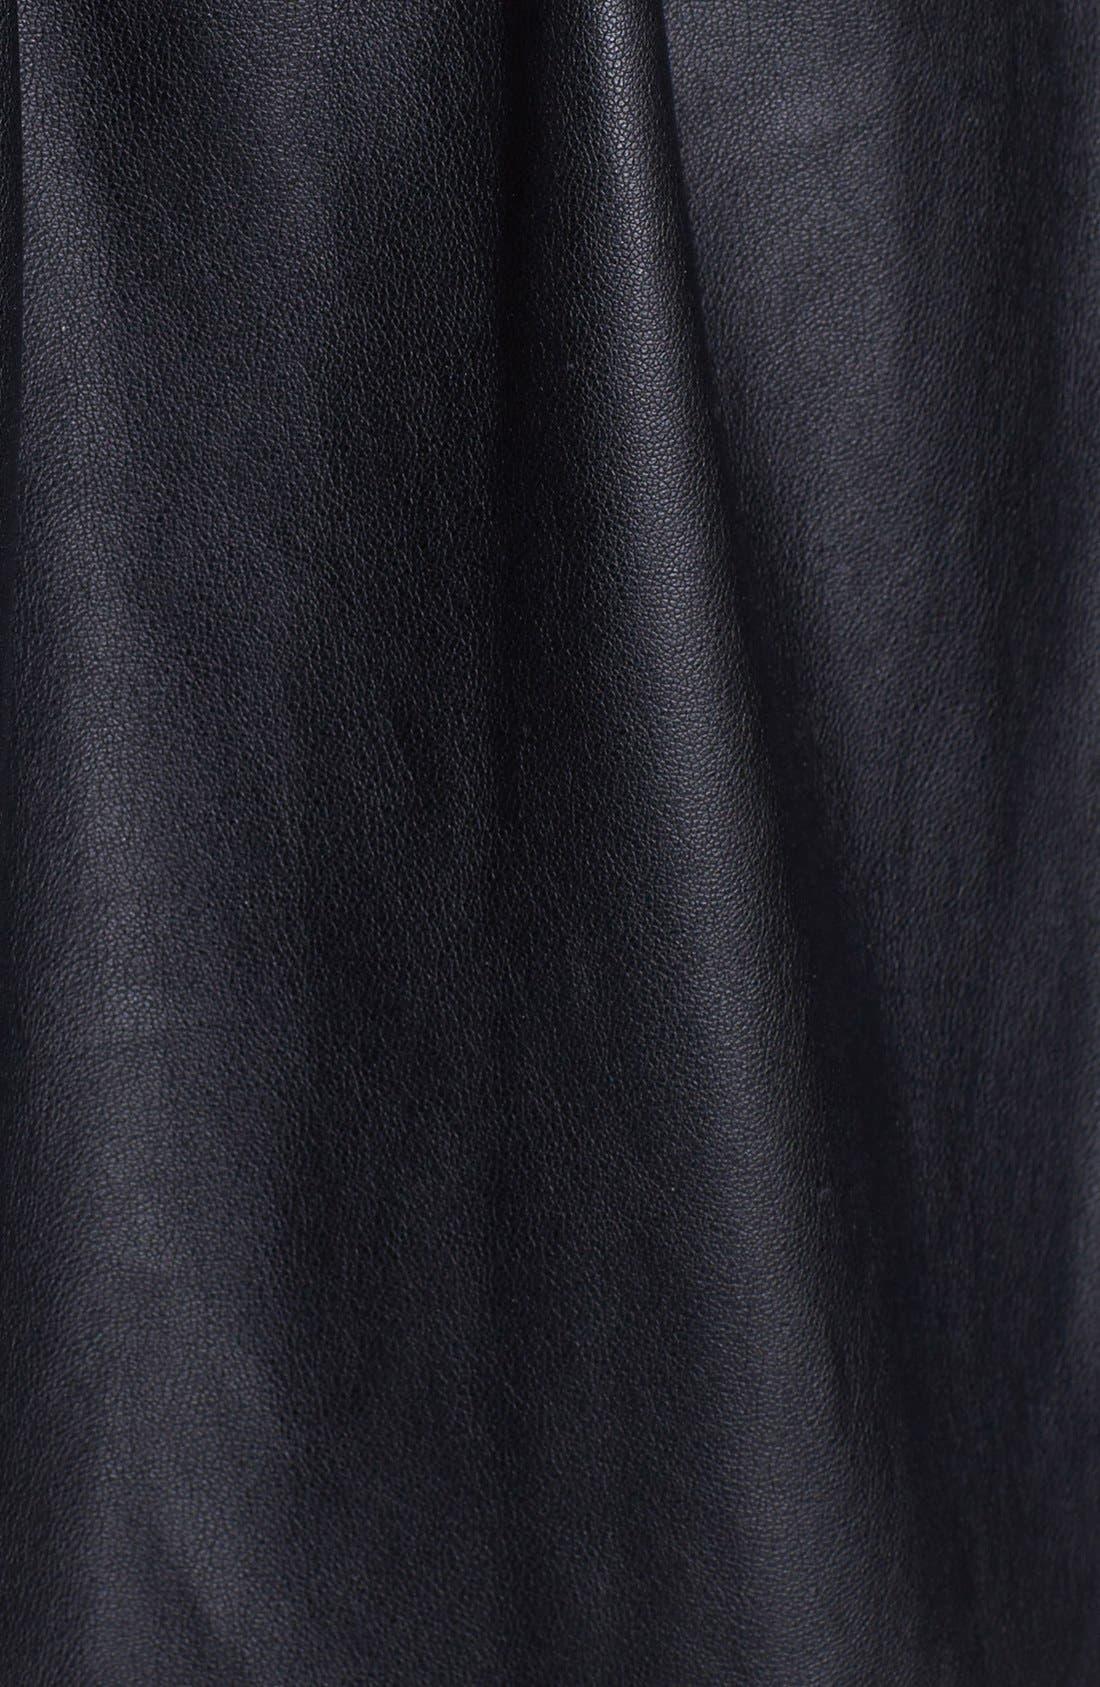 Alternate Image 3  - Pink Tartan 'Moss' Faux Leather Skirt